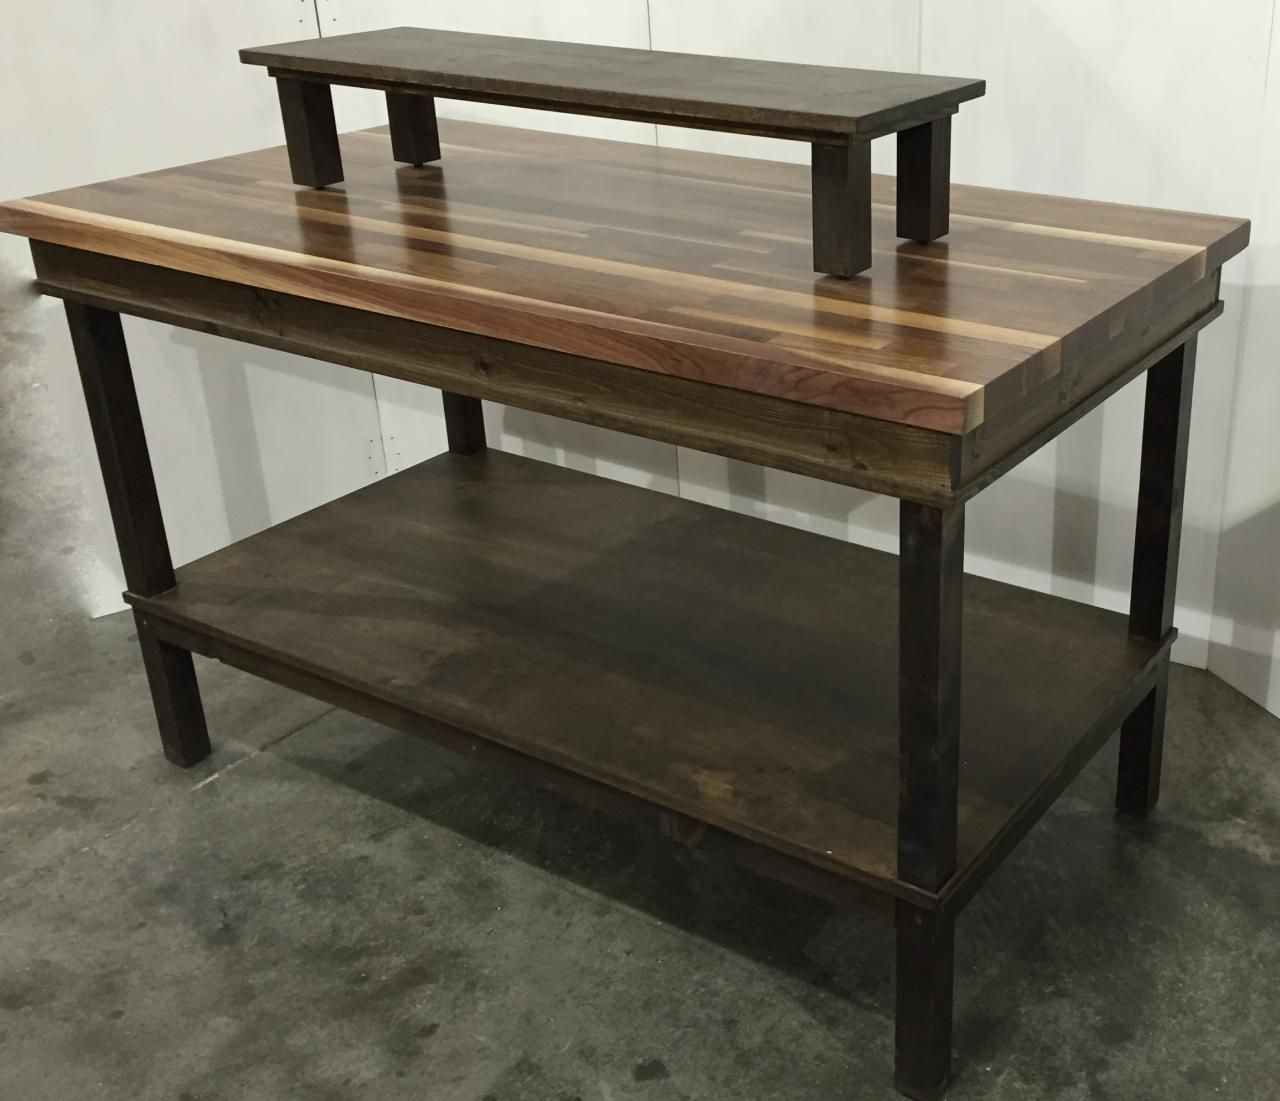 rustic wood retail display table shelf smaller rise